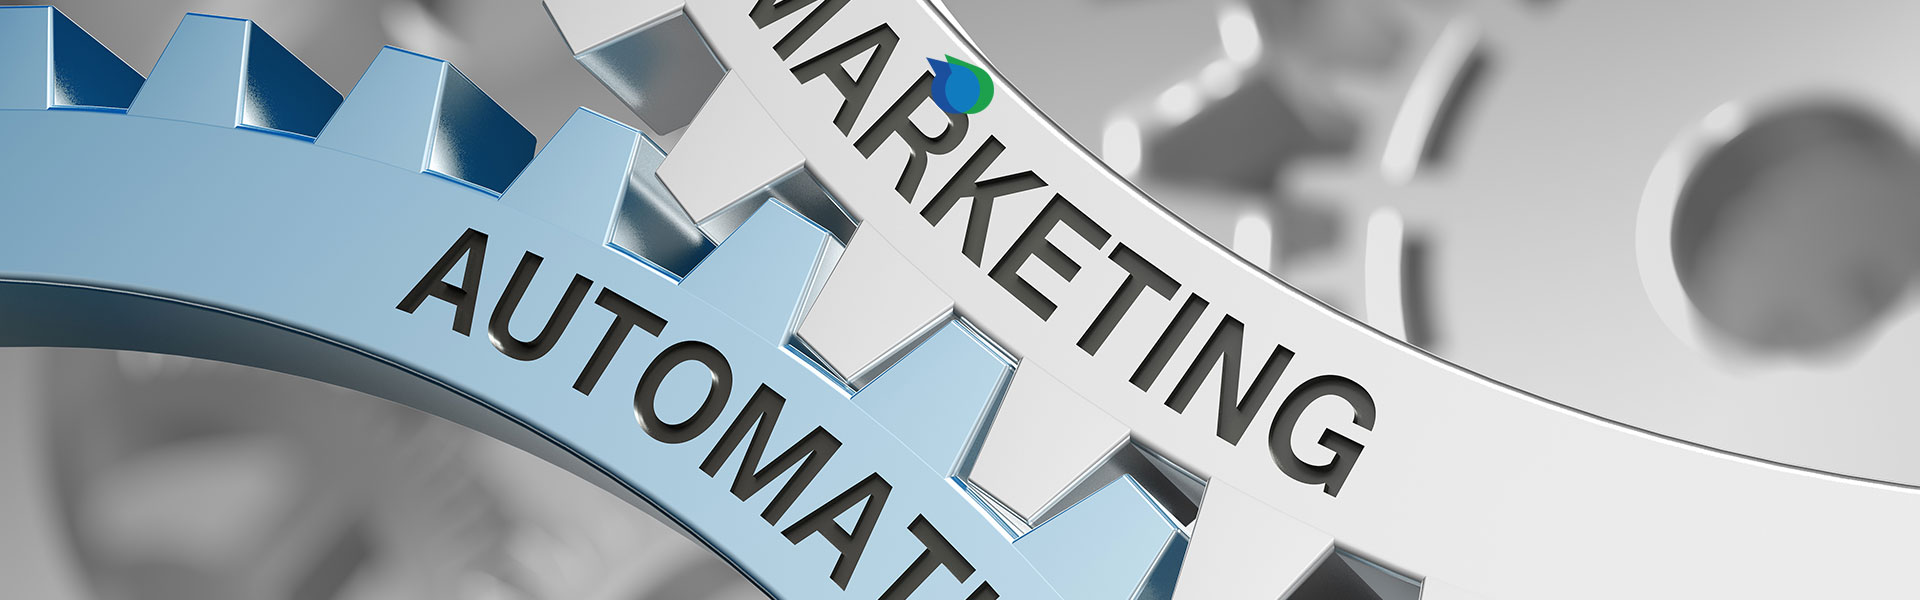 Marketing-Automation.jpg